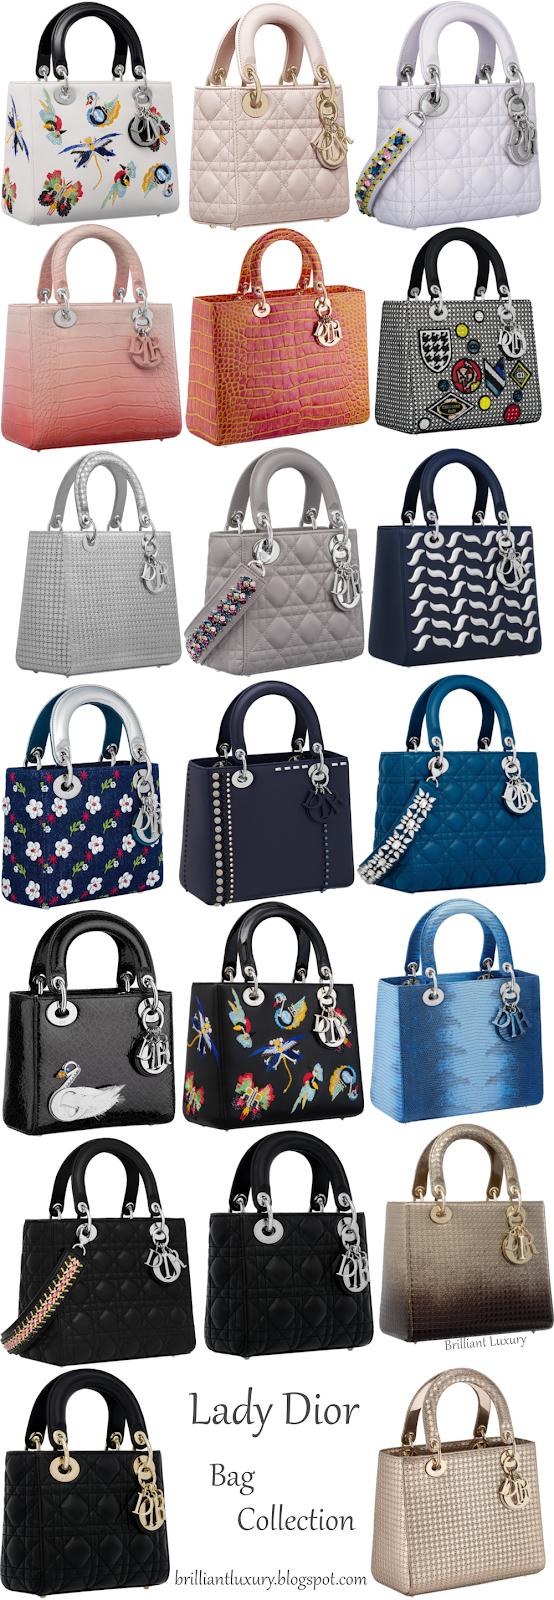 Lady Dior Bag Collection #brilliantluxury